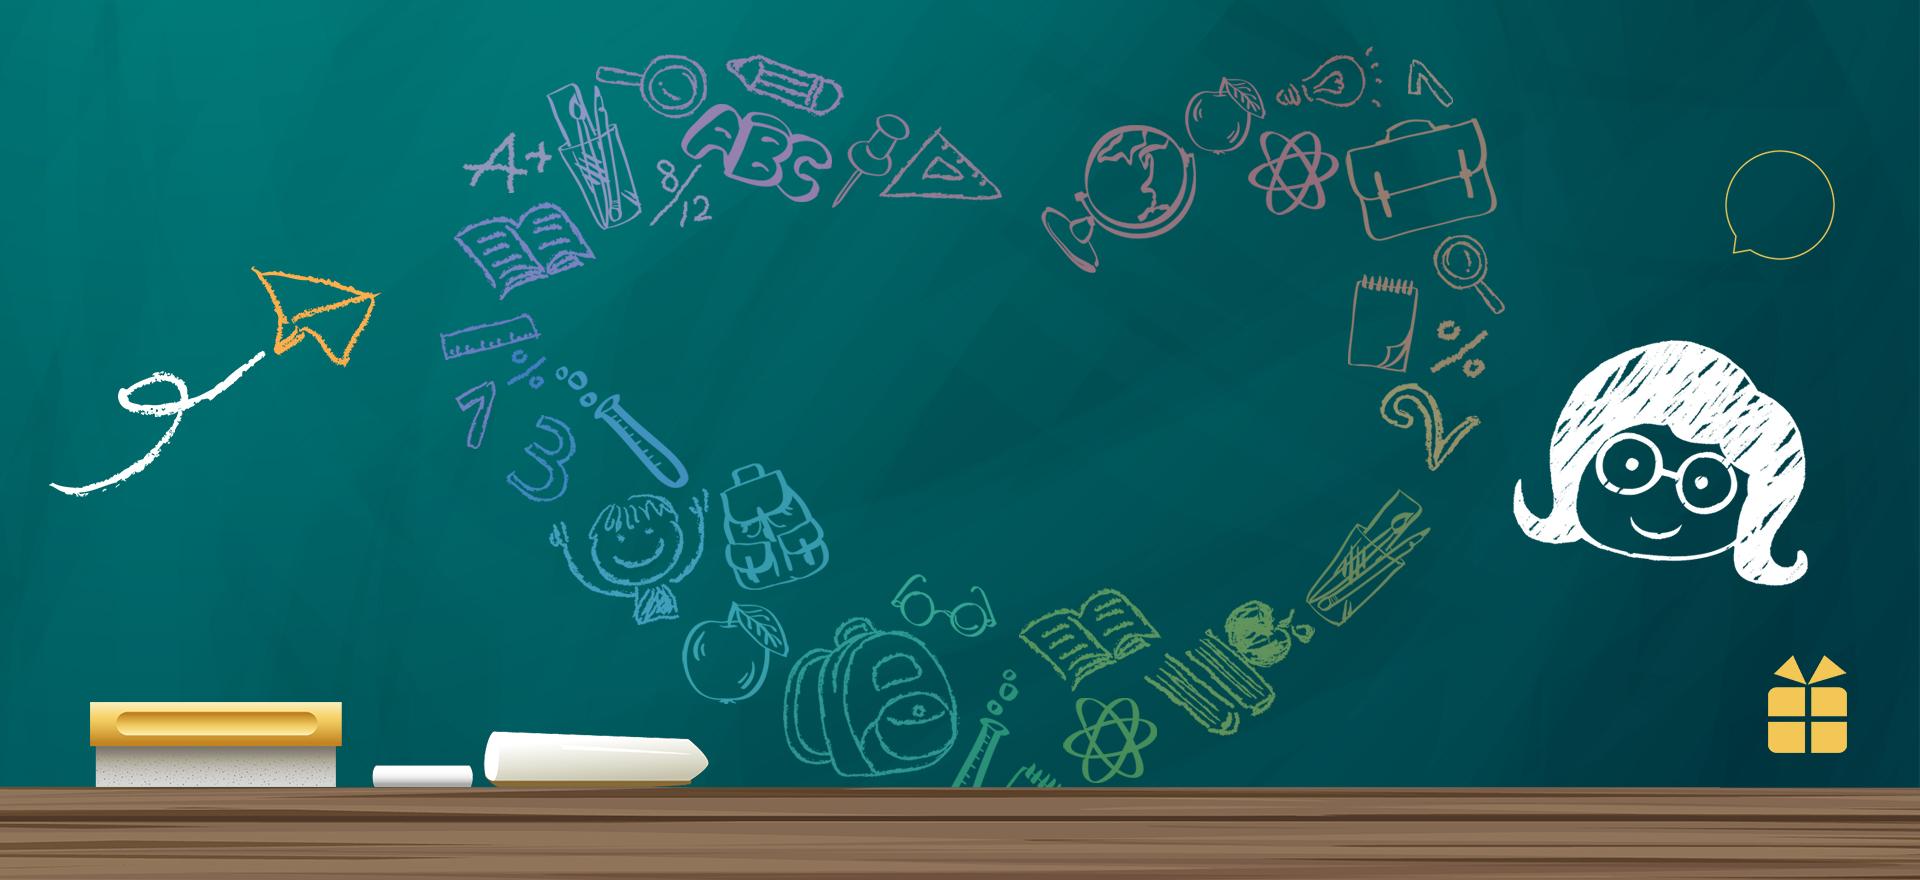 Thanksgiving Teacher Day Blackboard Background